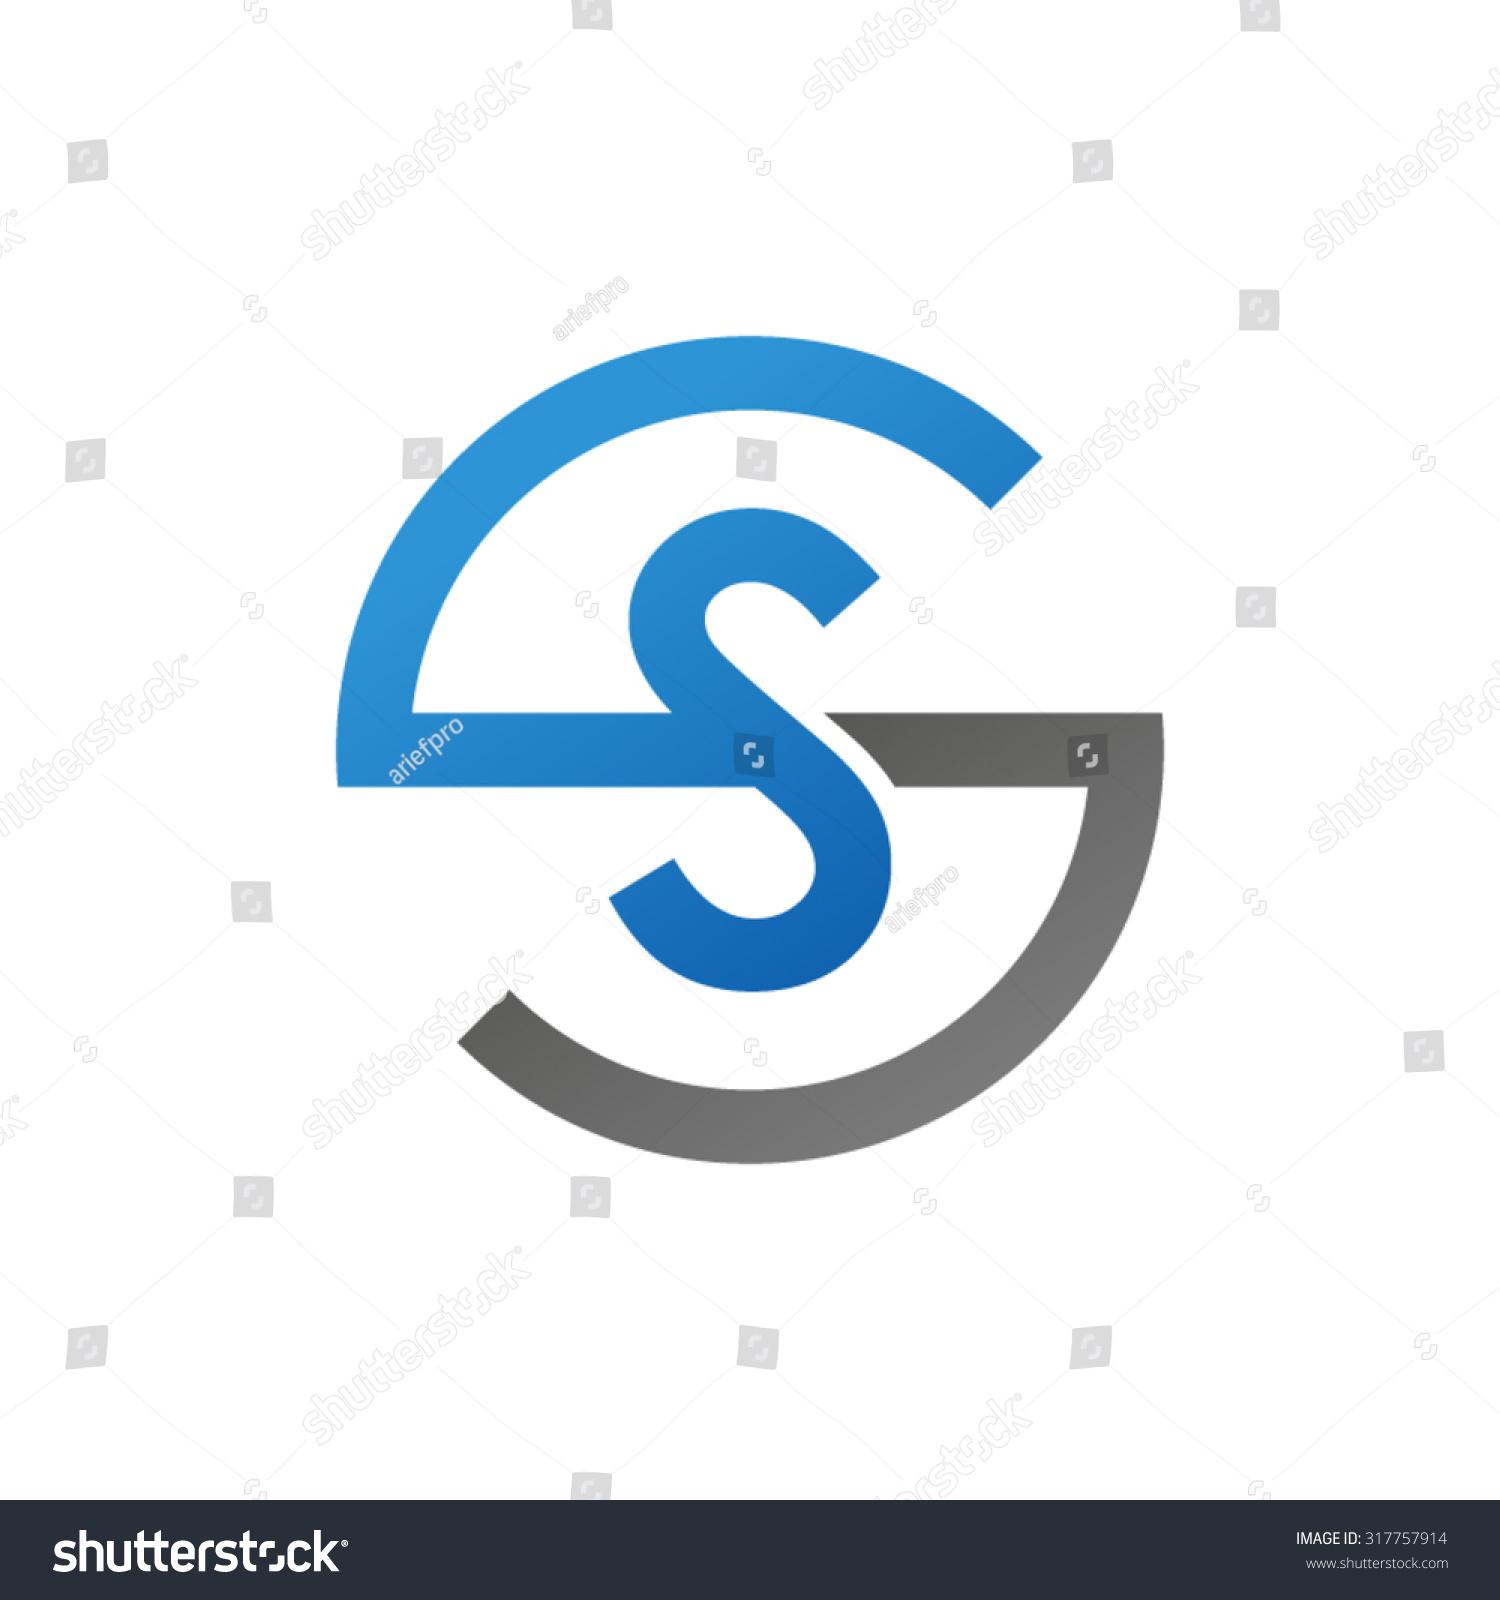 Ss Logo Images - ClipArt Best